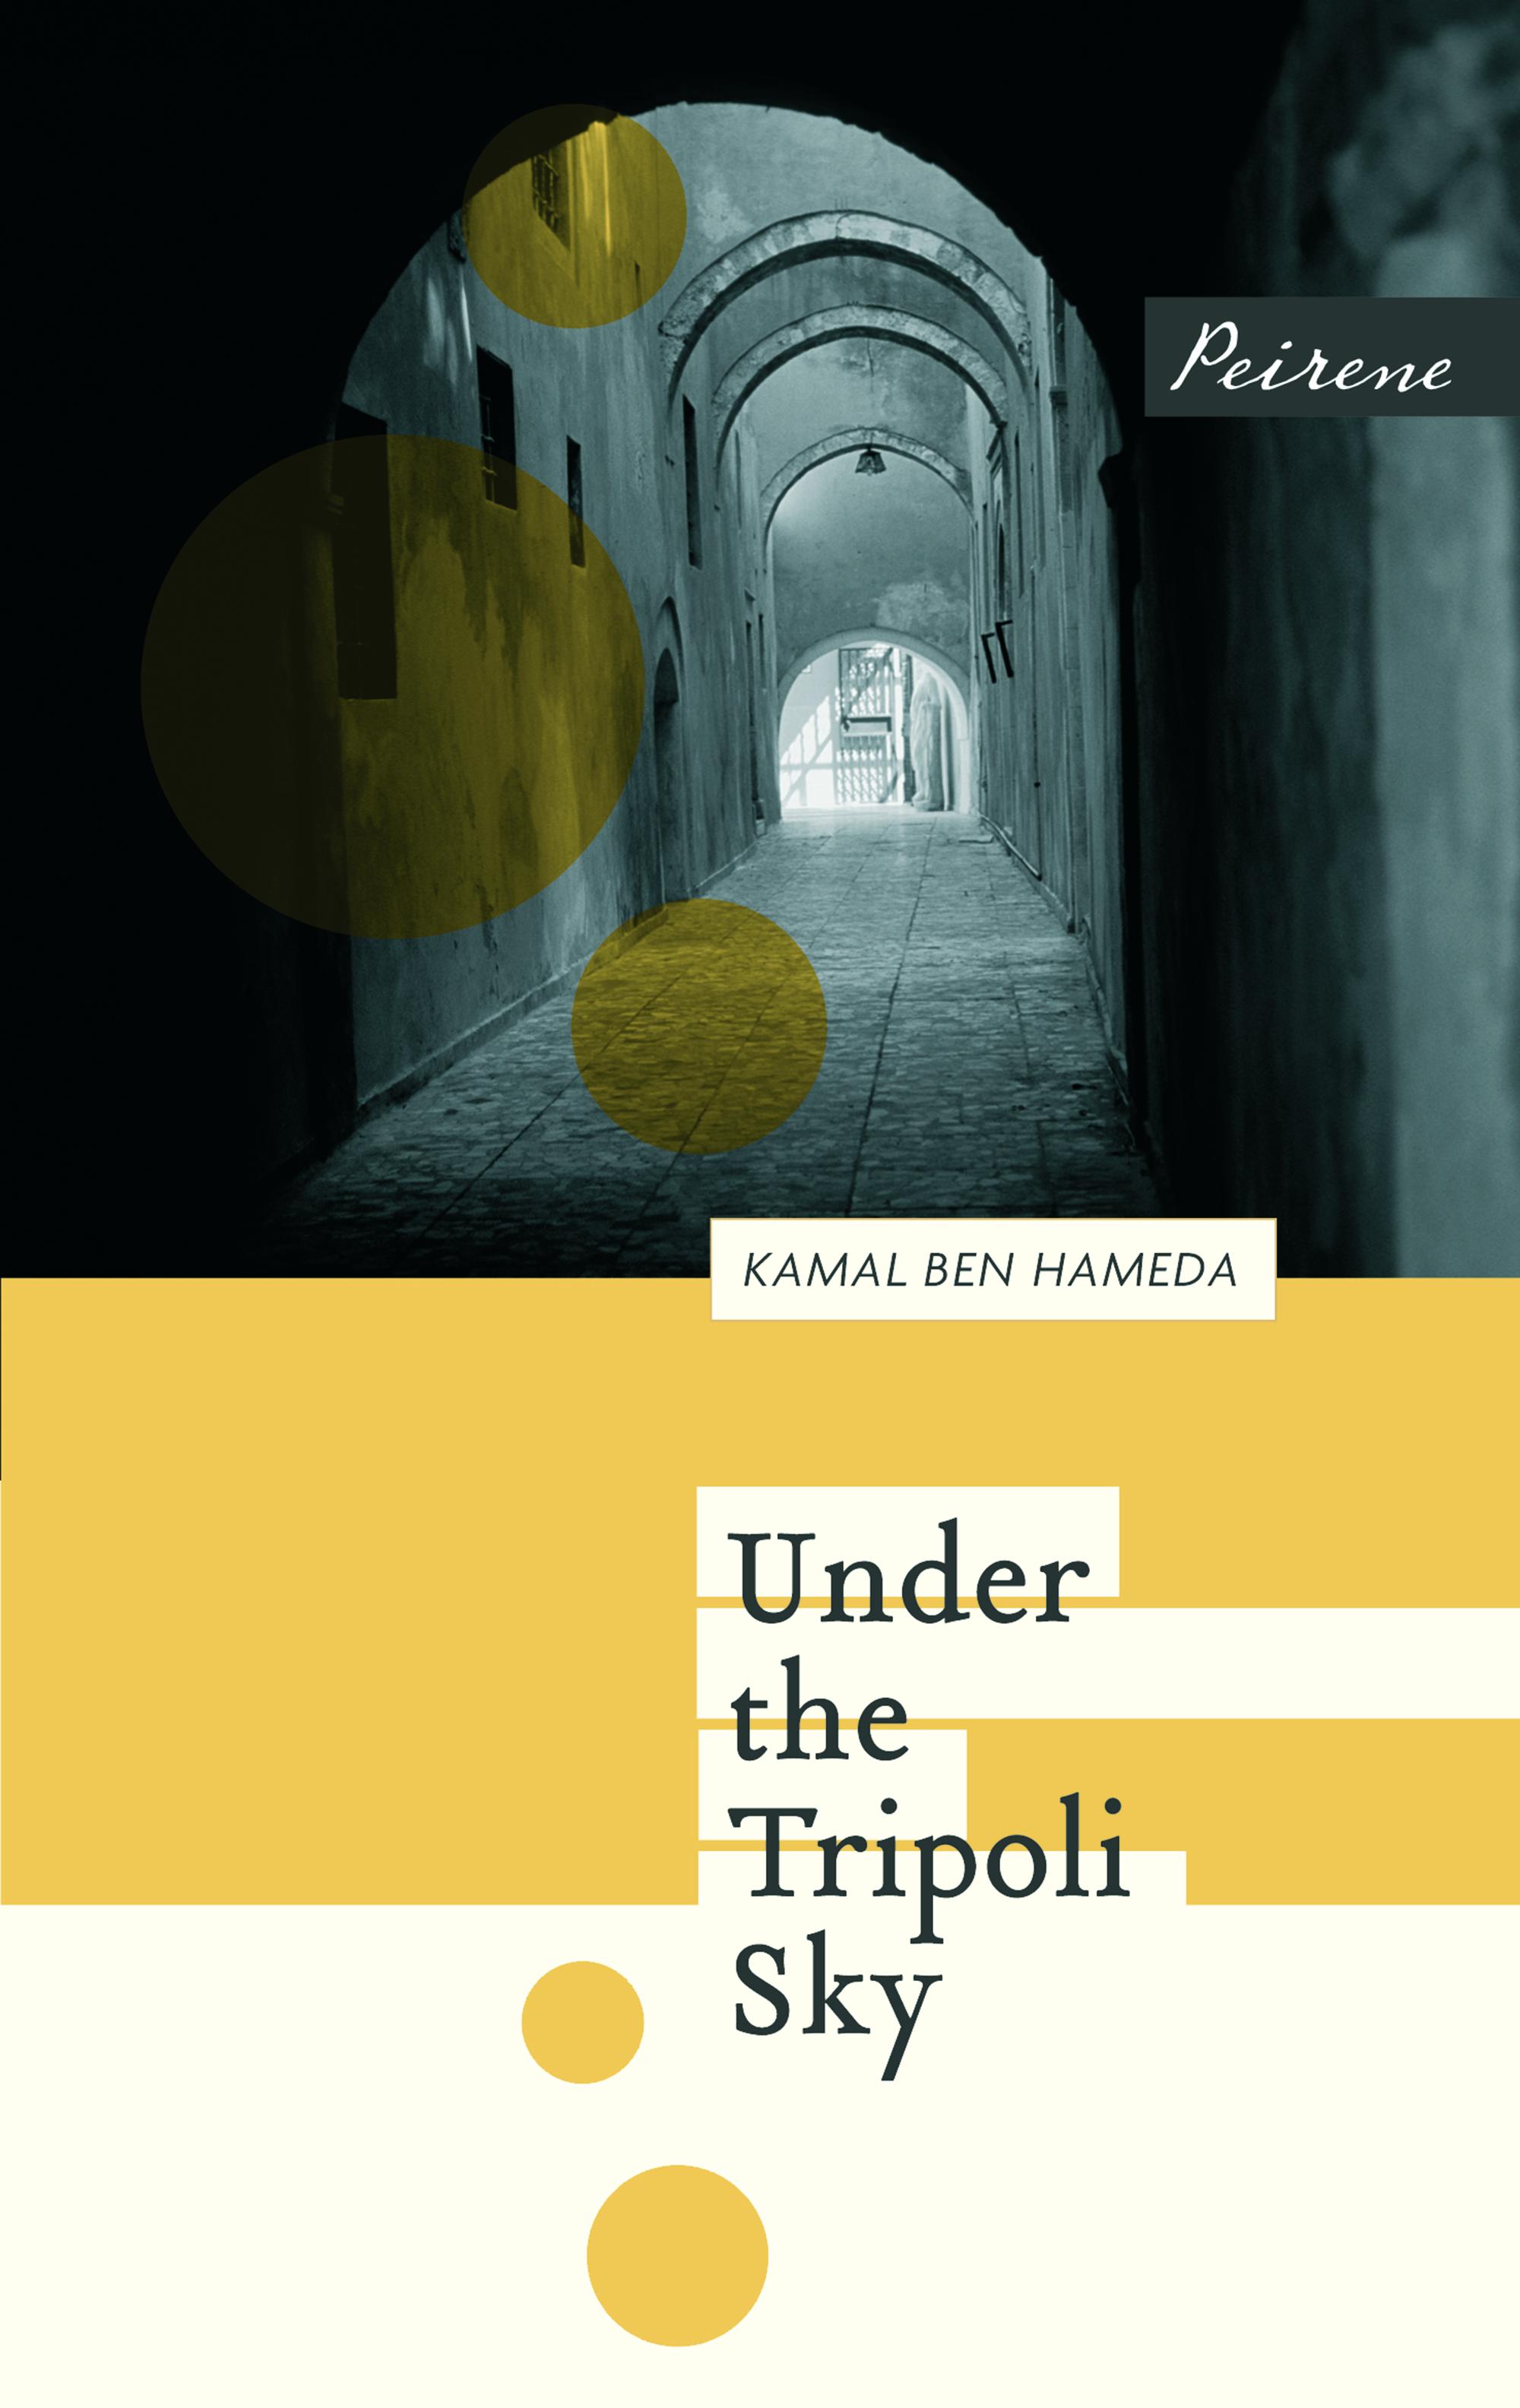 Under the Tripoli sky